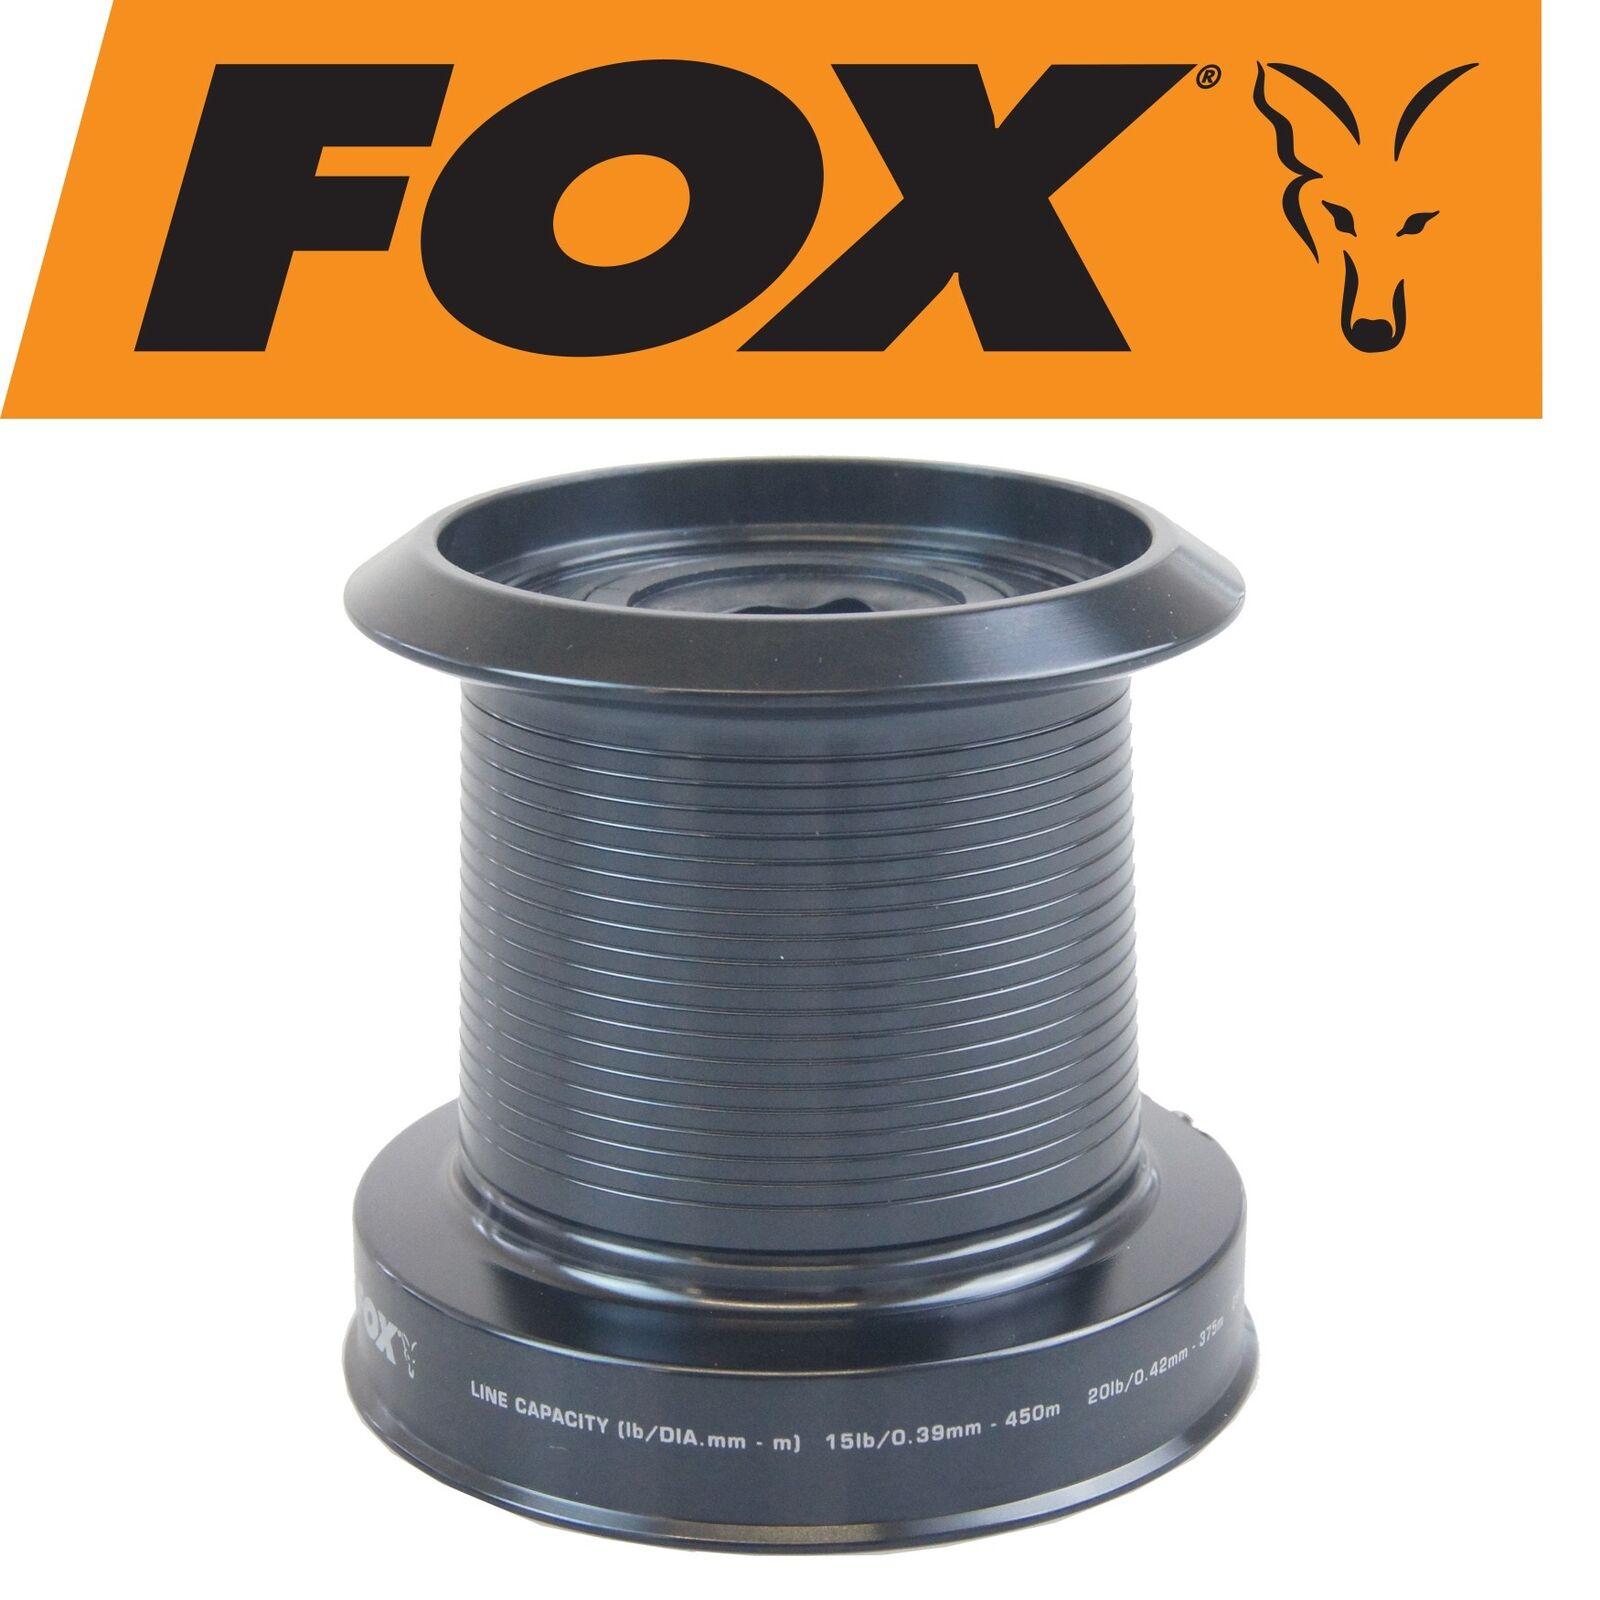 Fox EOS 12000 SPARE SPOOL Deep-Bobina di di Deep-Bobina ricambio, per Bobina Carpa ruolo d4a8a6